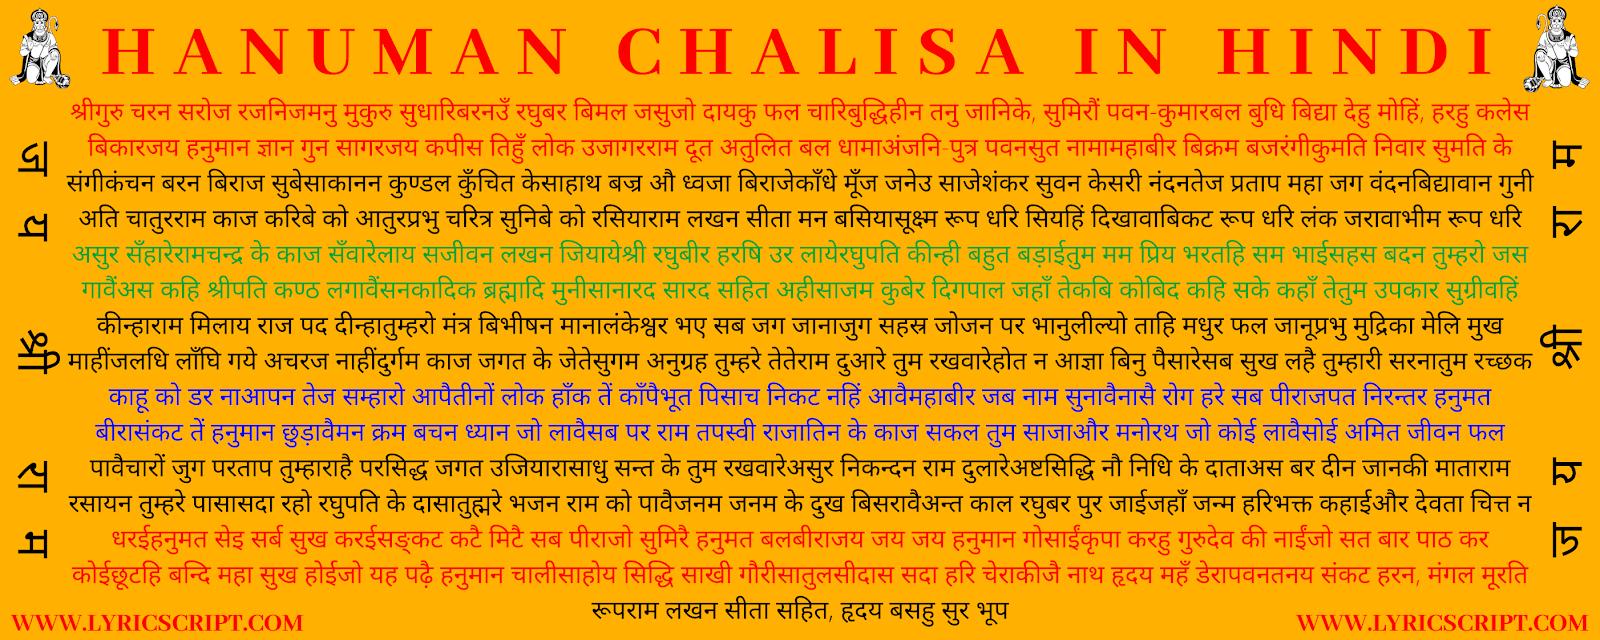 hanuman chalisa hindi hd photo download